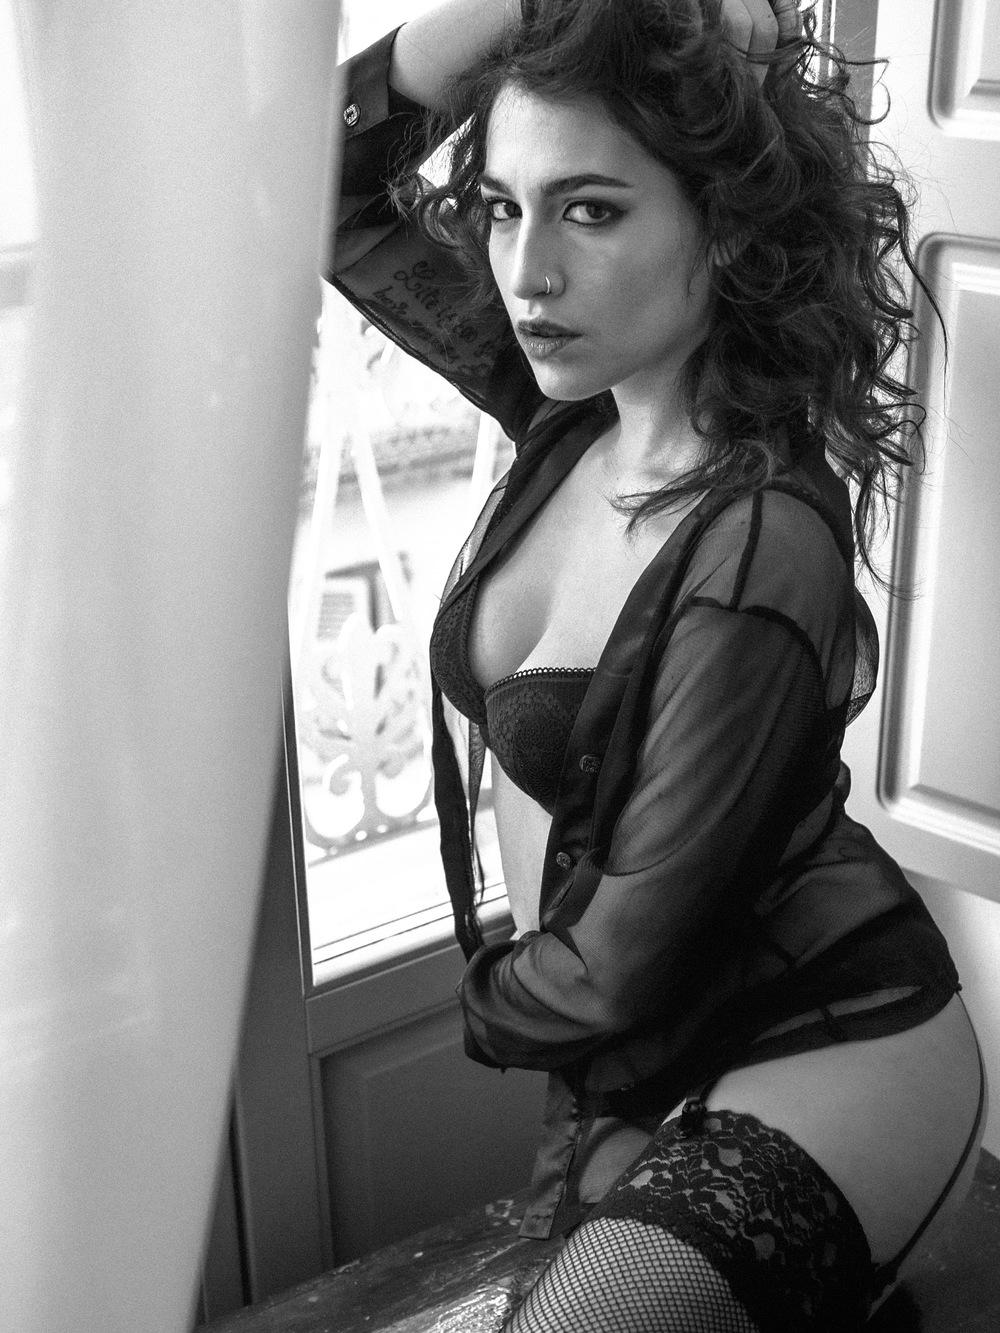 Model: Alessandra Giulia